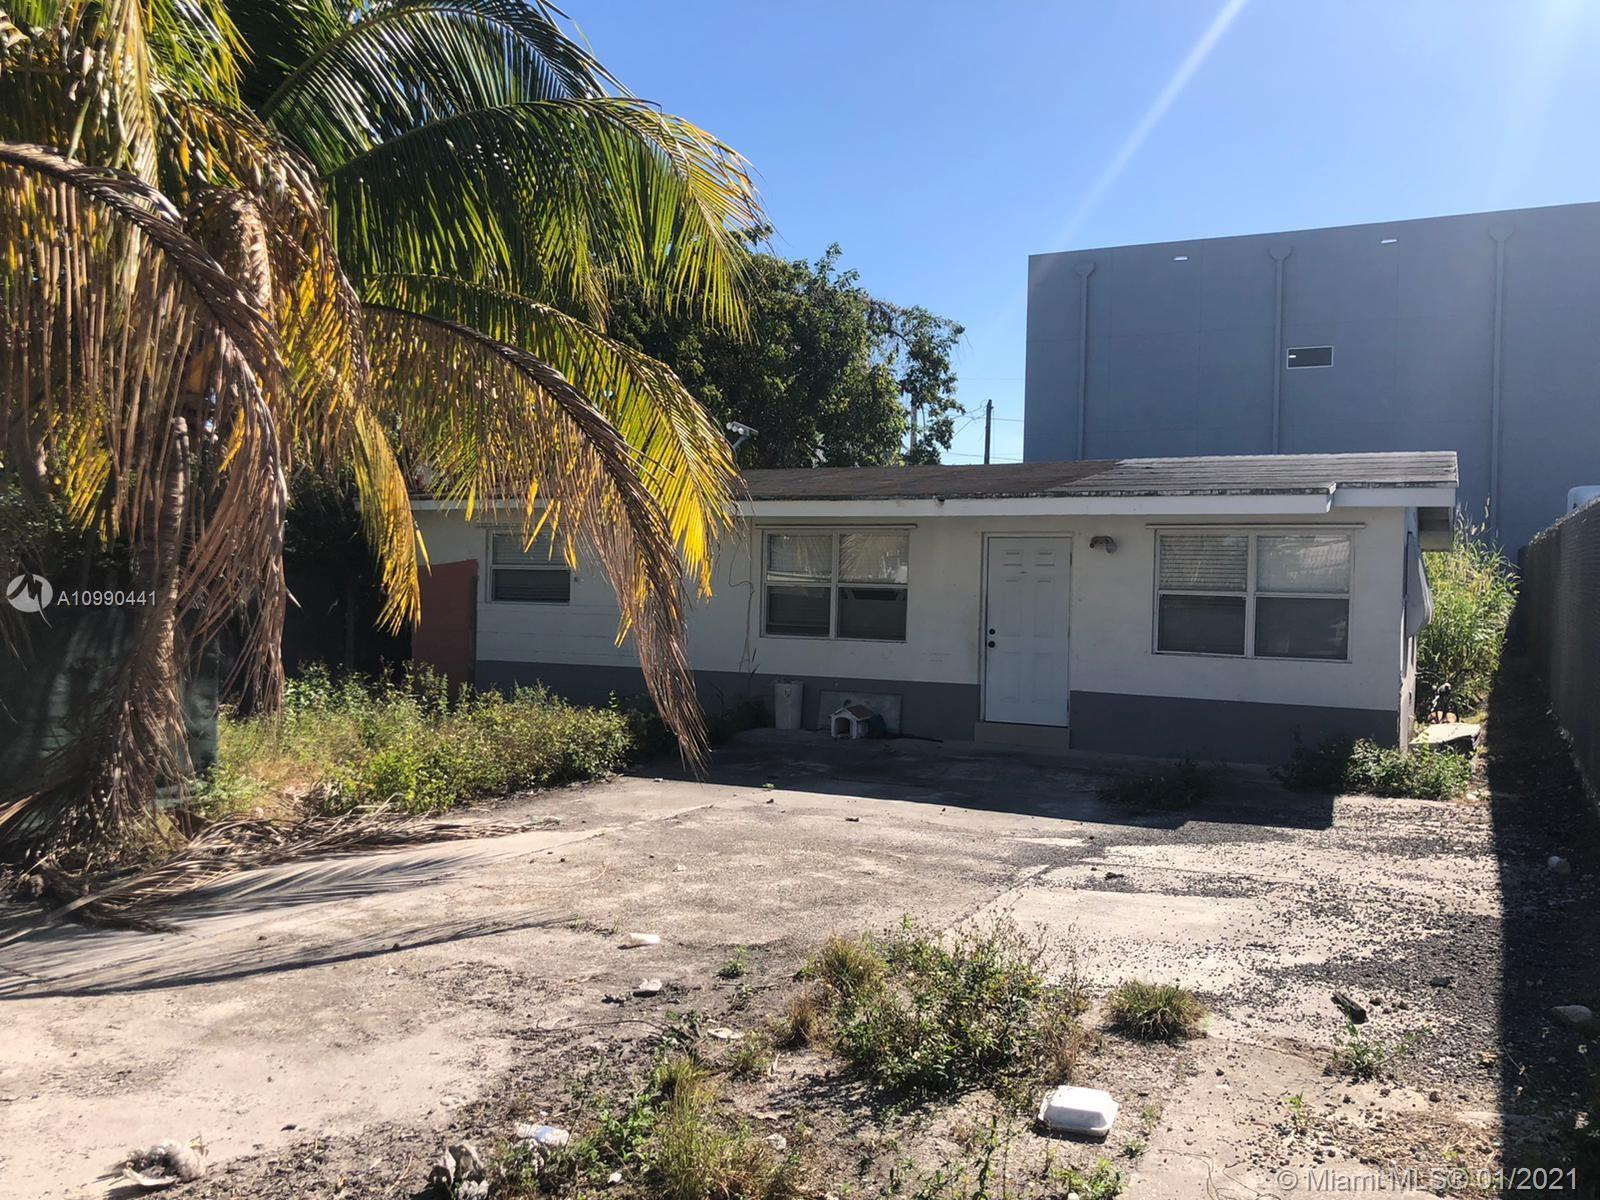 A10990441 Property Photo